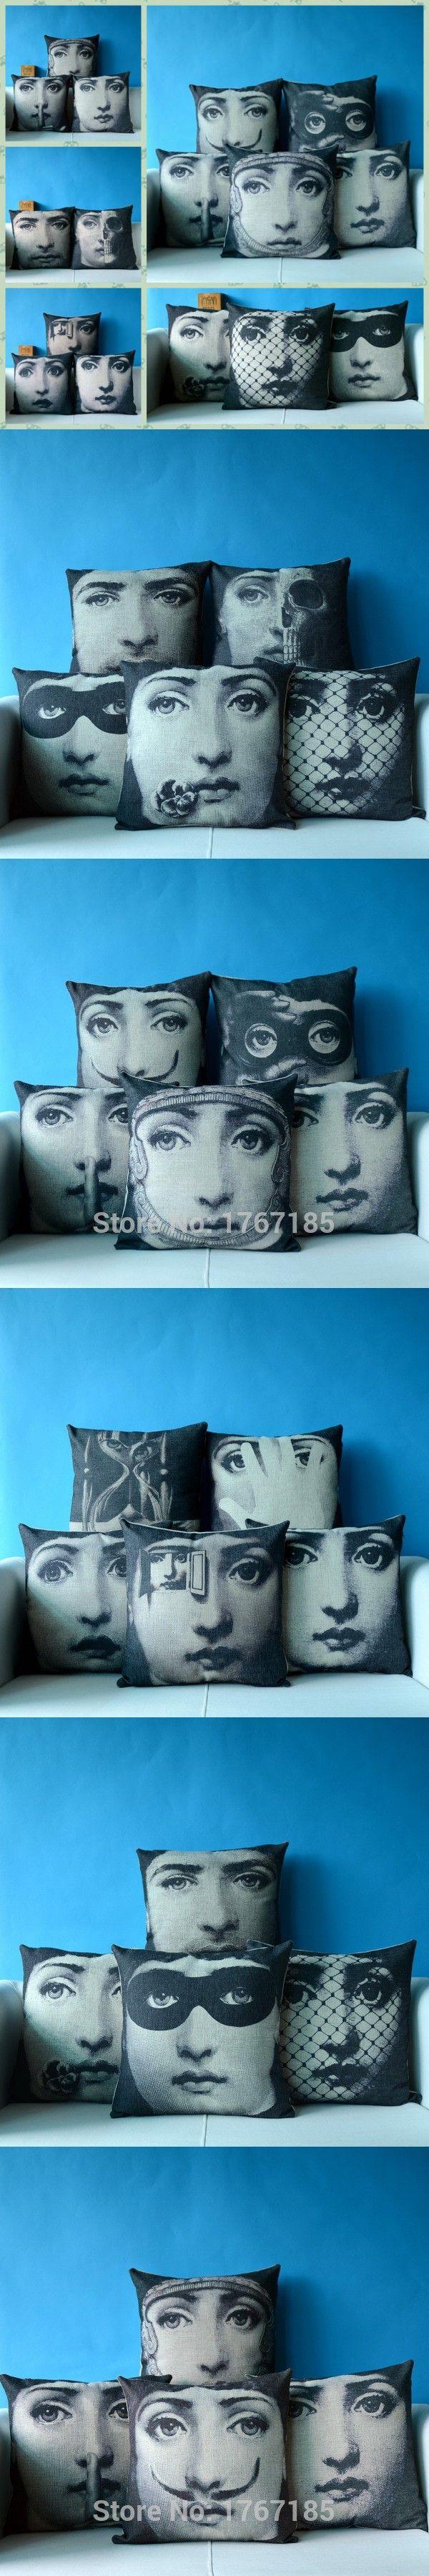 2015 Modern Cushion Covers Printed Art Fornasetti Bed Car Hotel Printed Luxury Home Decor Sofa Vintage Pillowcase Cushion Cover $8.99